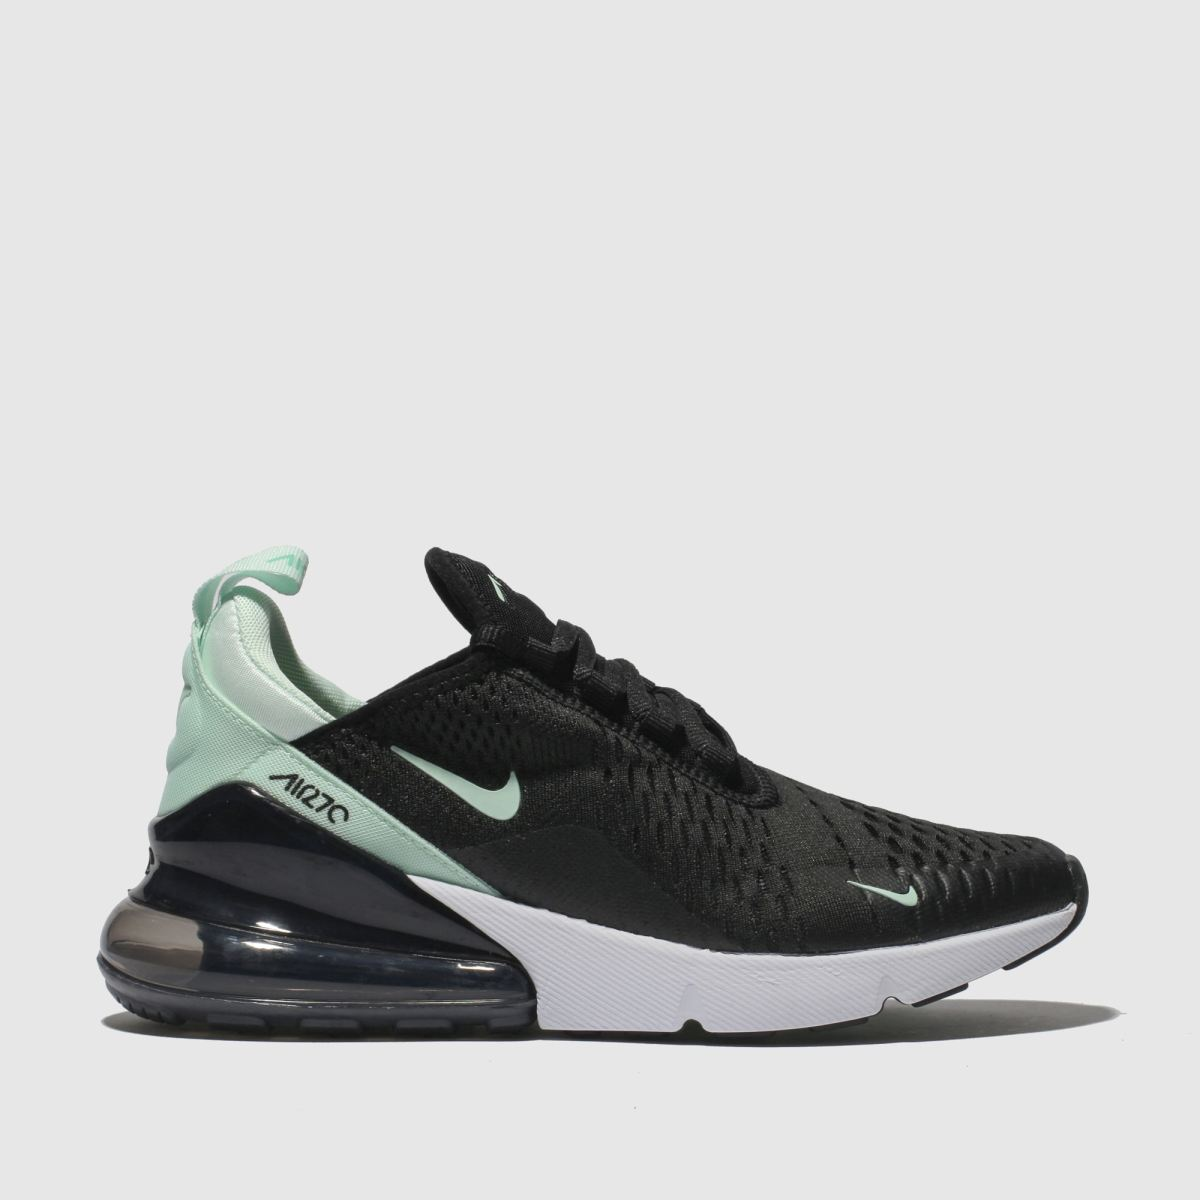 Nike Black & Green Air Max 270 Trainers